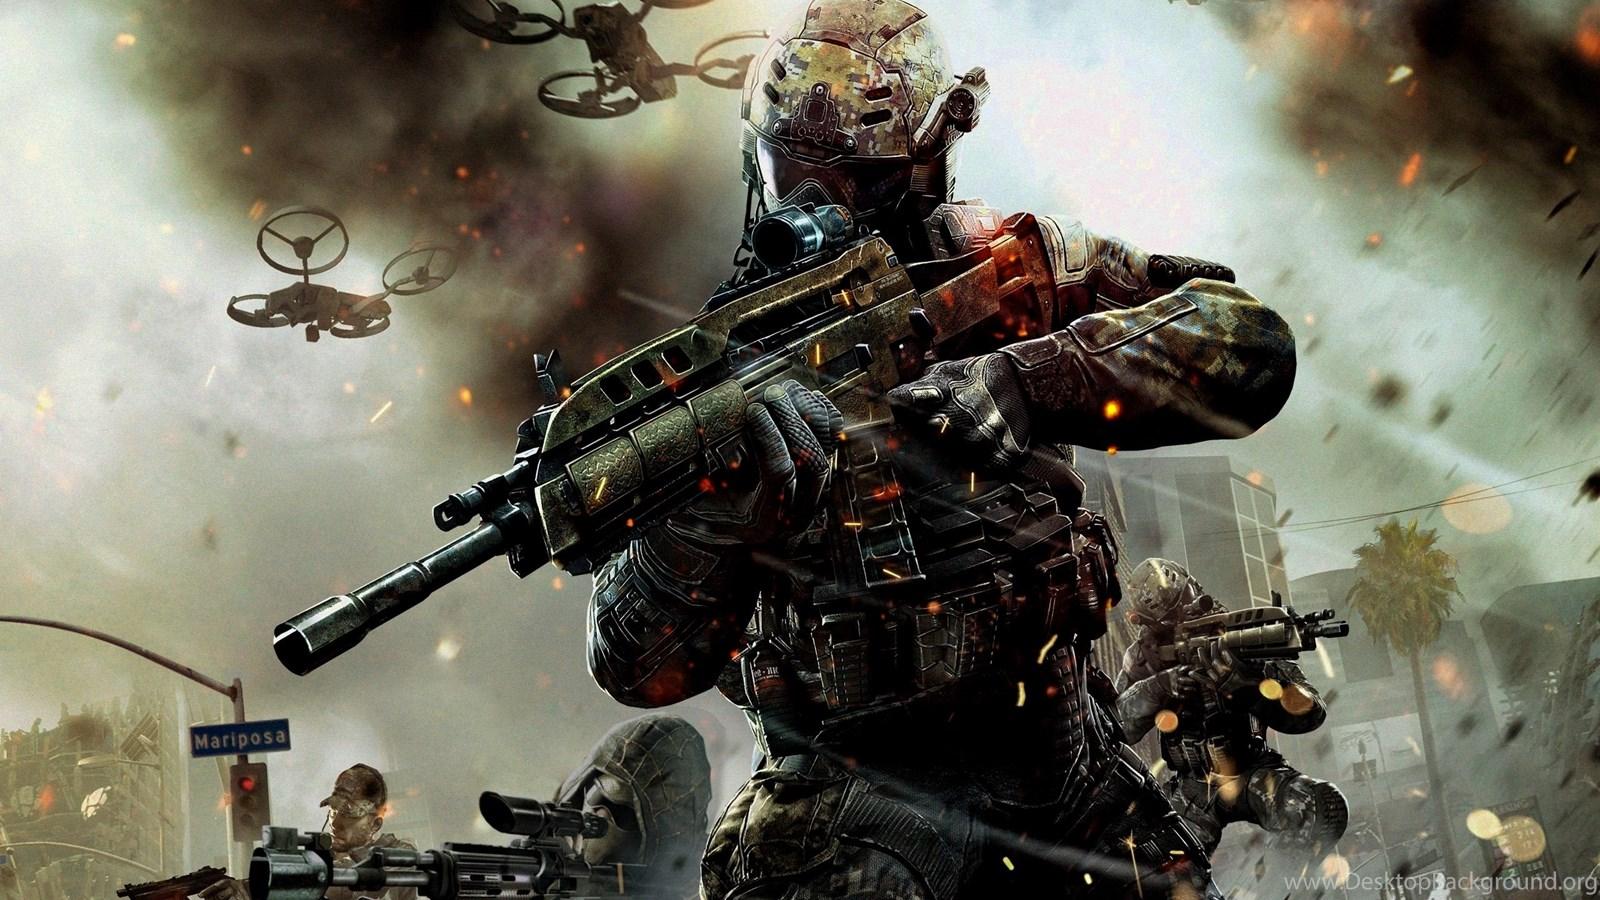 Call Of Duty 4 Modern Warfare Wallpapers 1600 1200 High